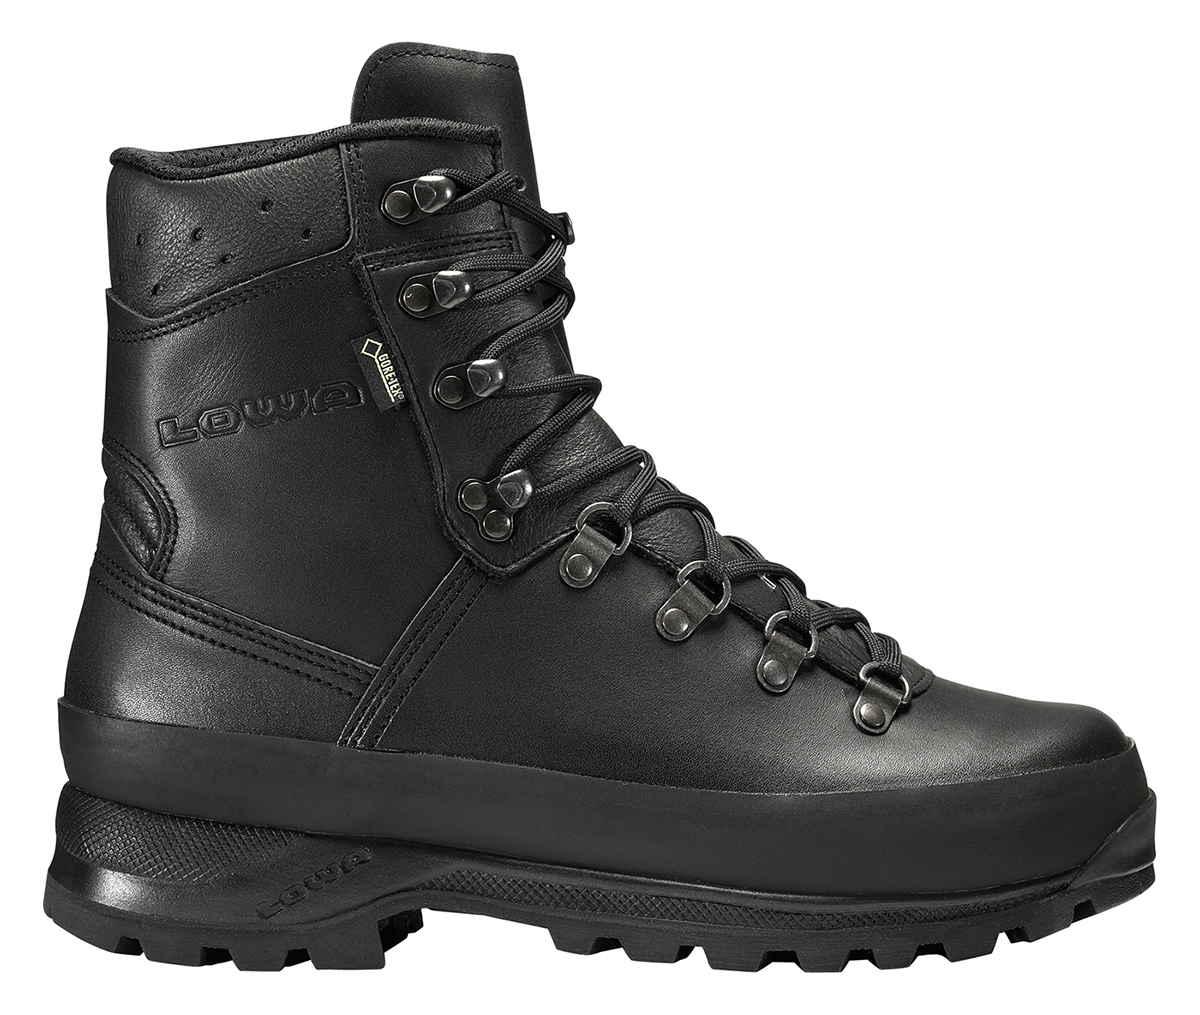 Lowa Mountain Gtx Gore Tex Waterproof Police Military